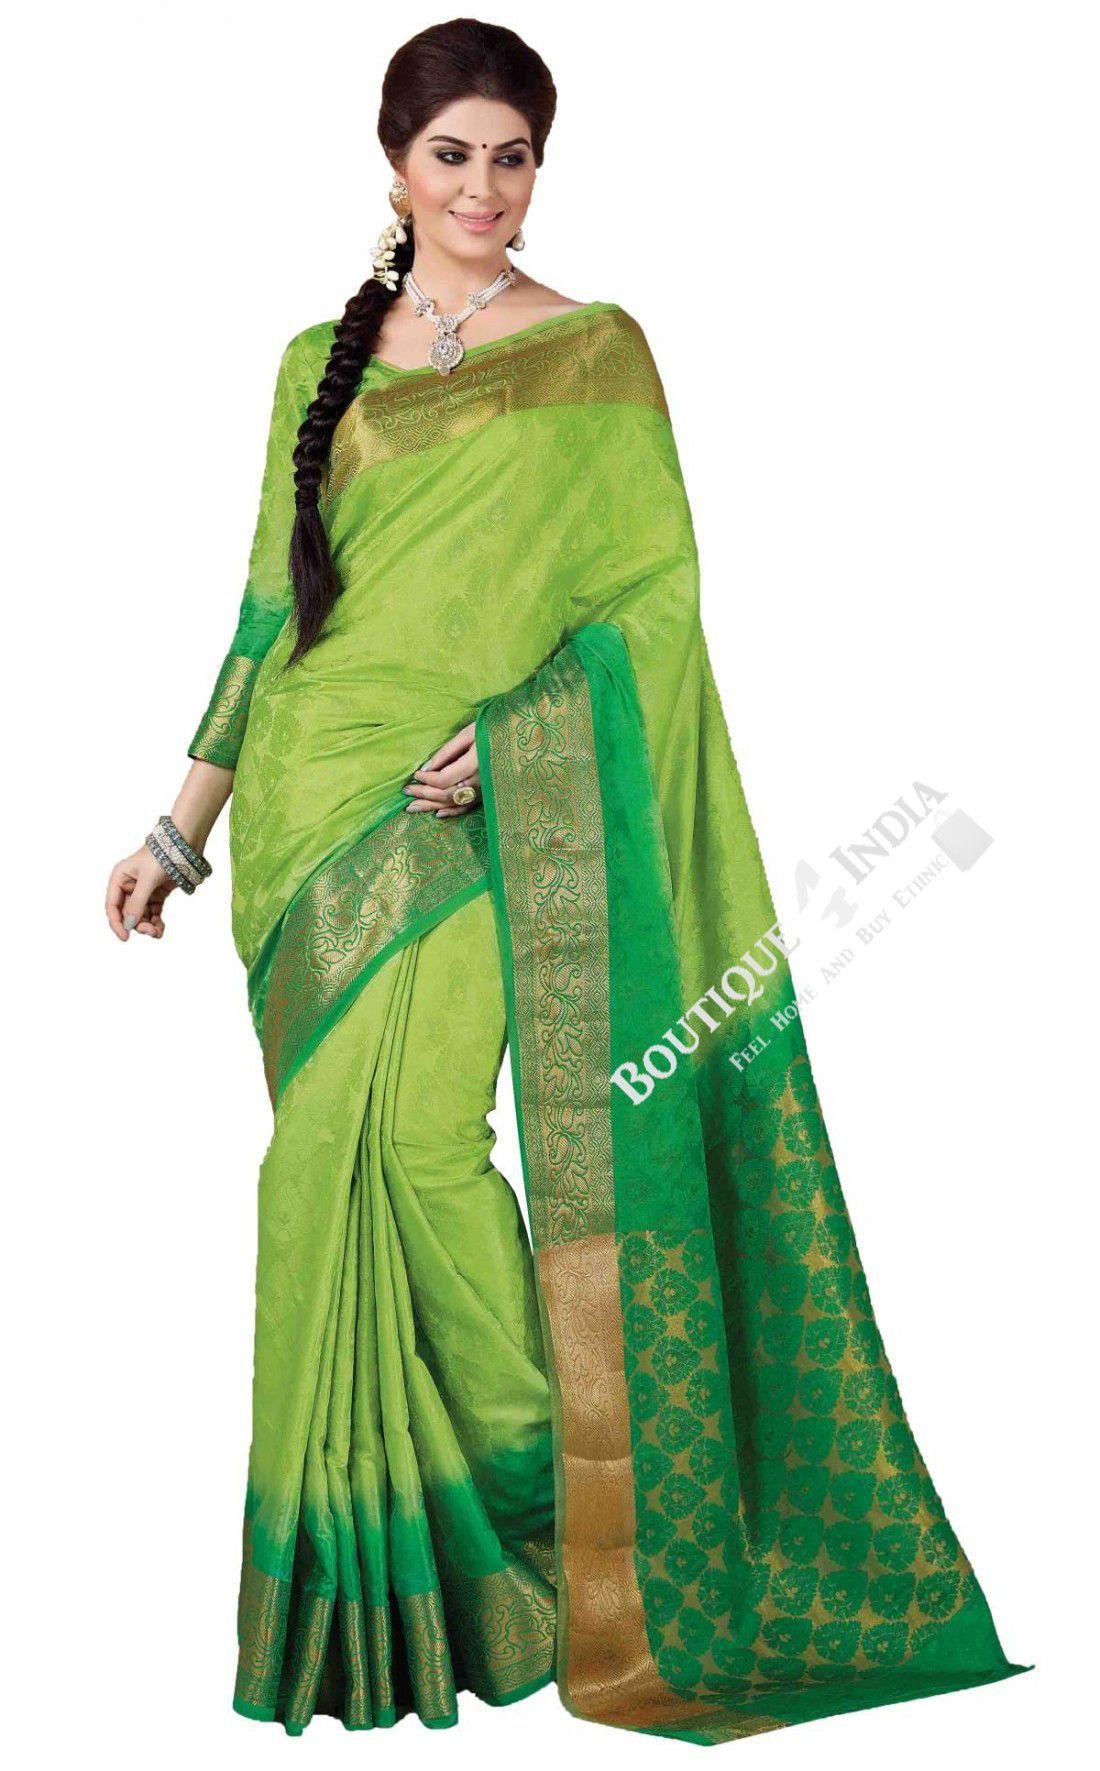 5d65f28fbfd44d Sarees - Light And Dark Green Silk Saree Collections - Traditional Silk  Saree   Wedding   Bridal   Party Wear